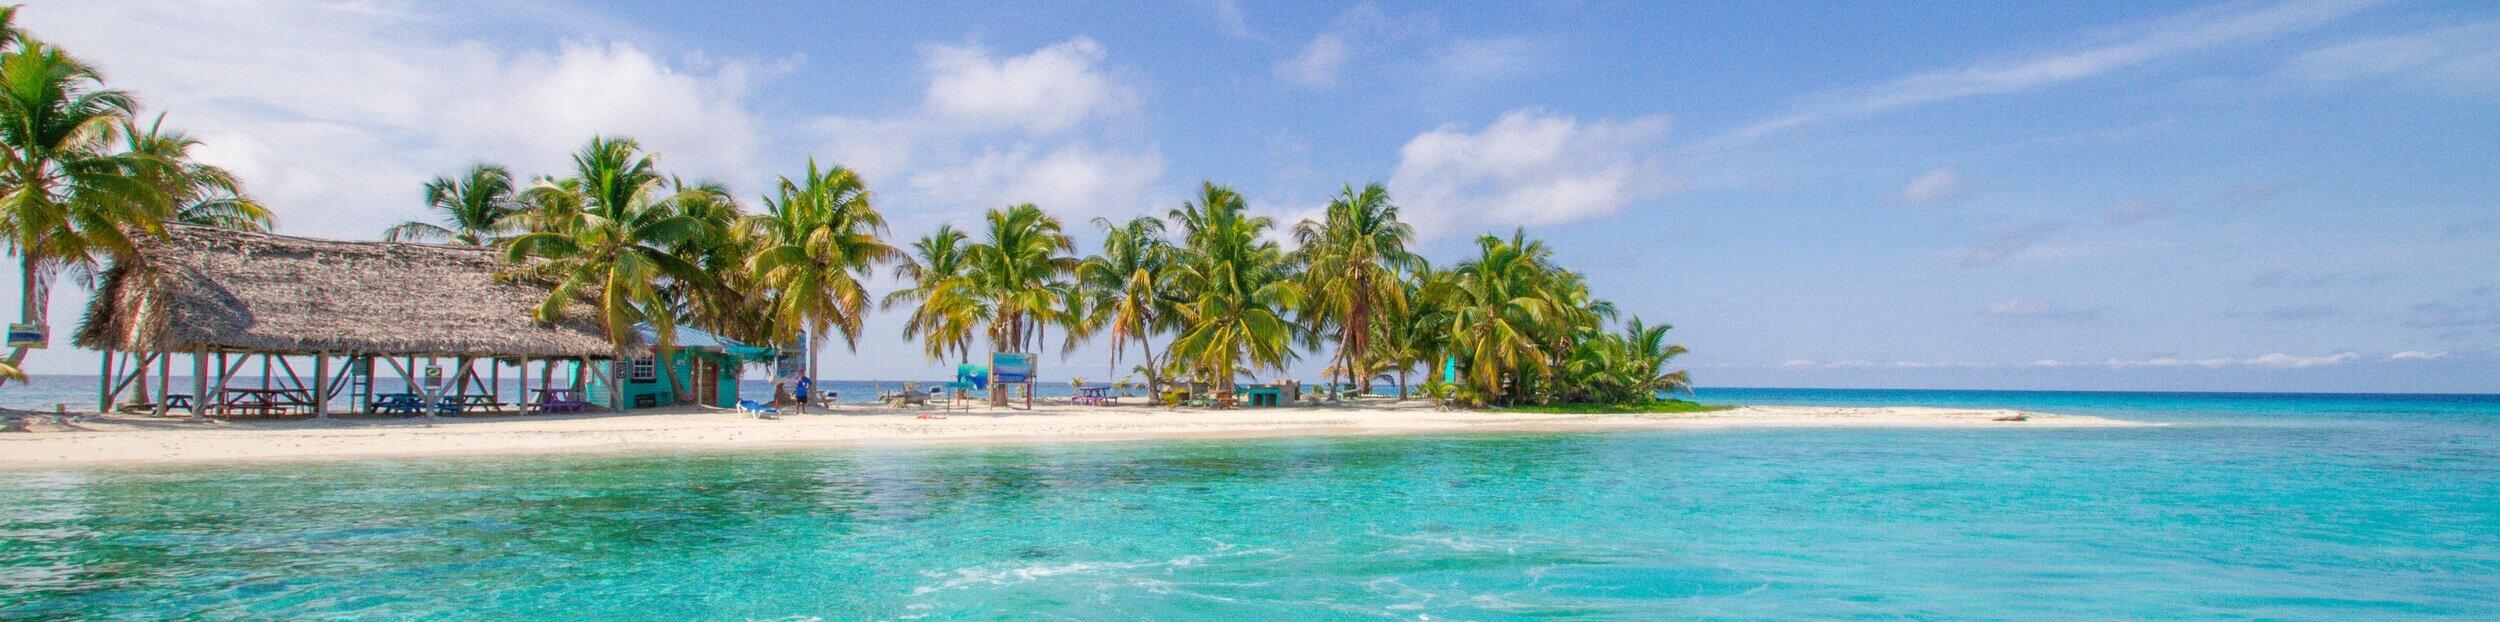 Belize+2019-4448.jpg